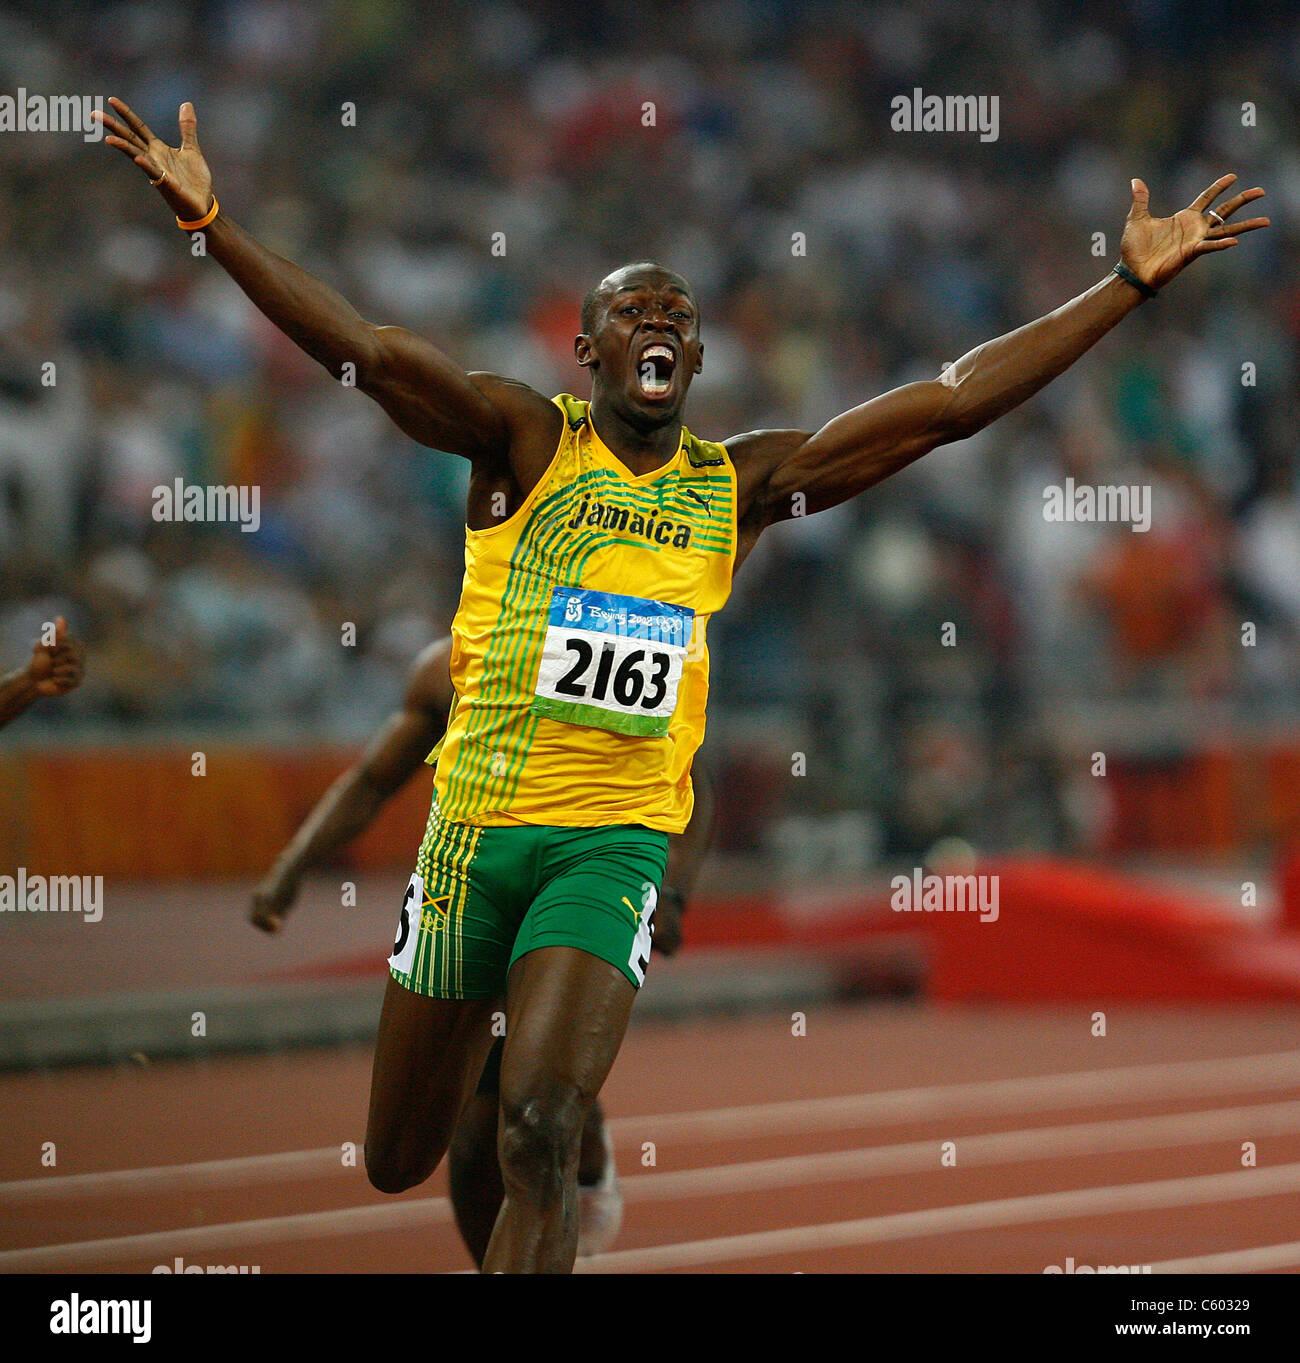 2eed0069b7a USAIN BOLT JAMAICA OLYMPIC STADIUM BEIJING CHINA 20 August 2008 - Stock  Image